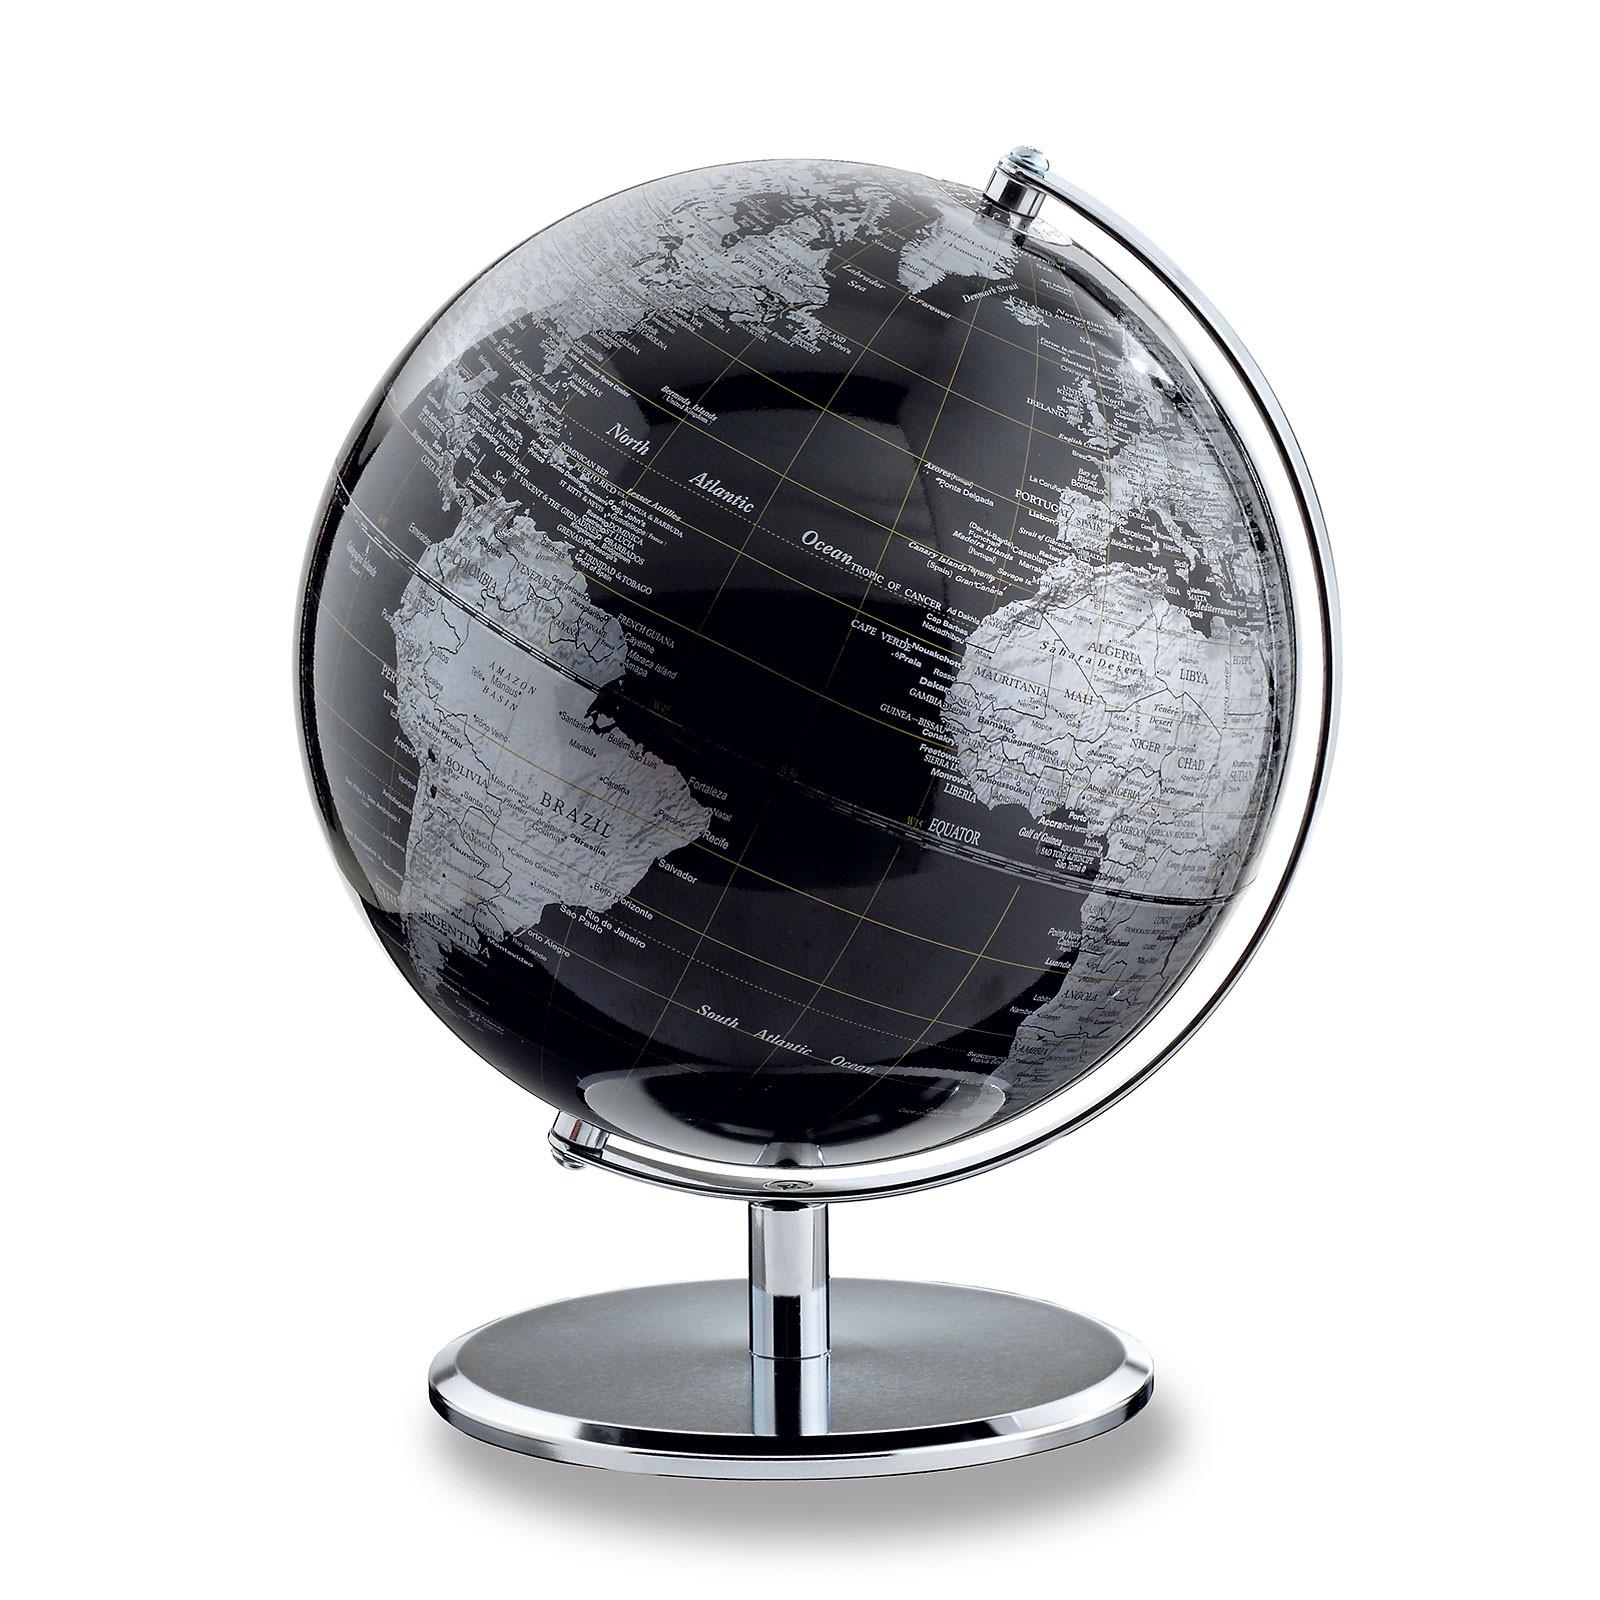 Emform Tischglobus Globus Planet 25 X 30 Cm Darkchrome Planet